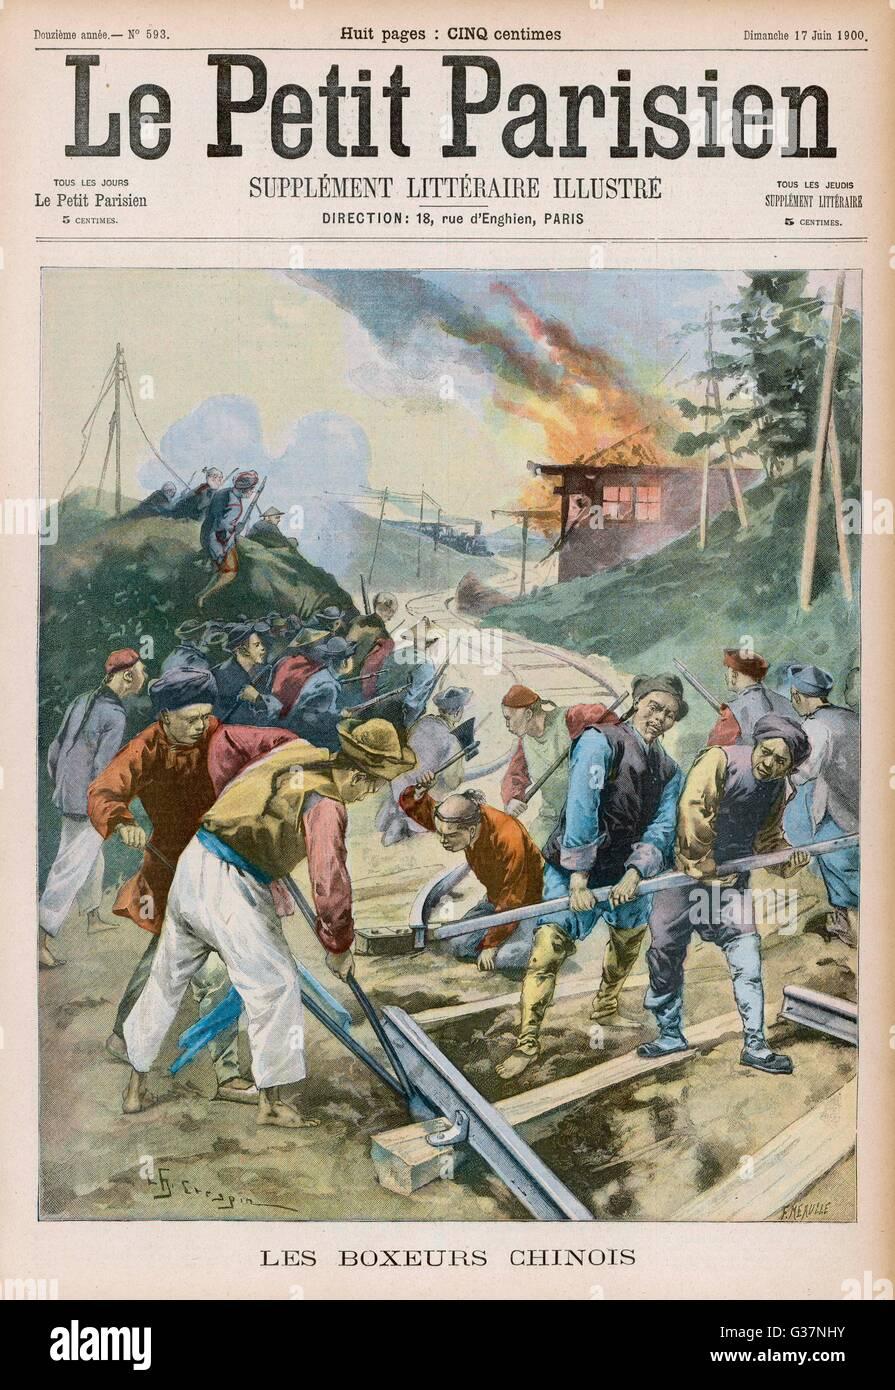 BOXER REBELLION Boxers sabotage the railway  between Peking and Hong-Kong        Date: June 1900 - Stock Image